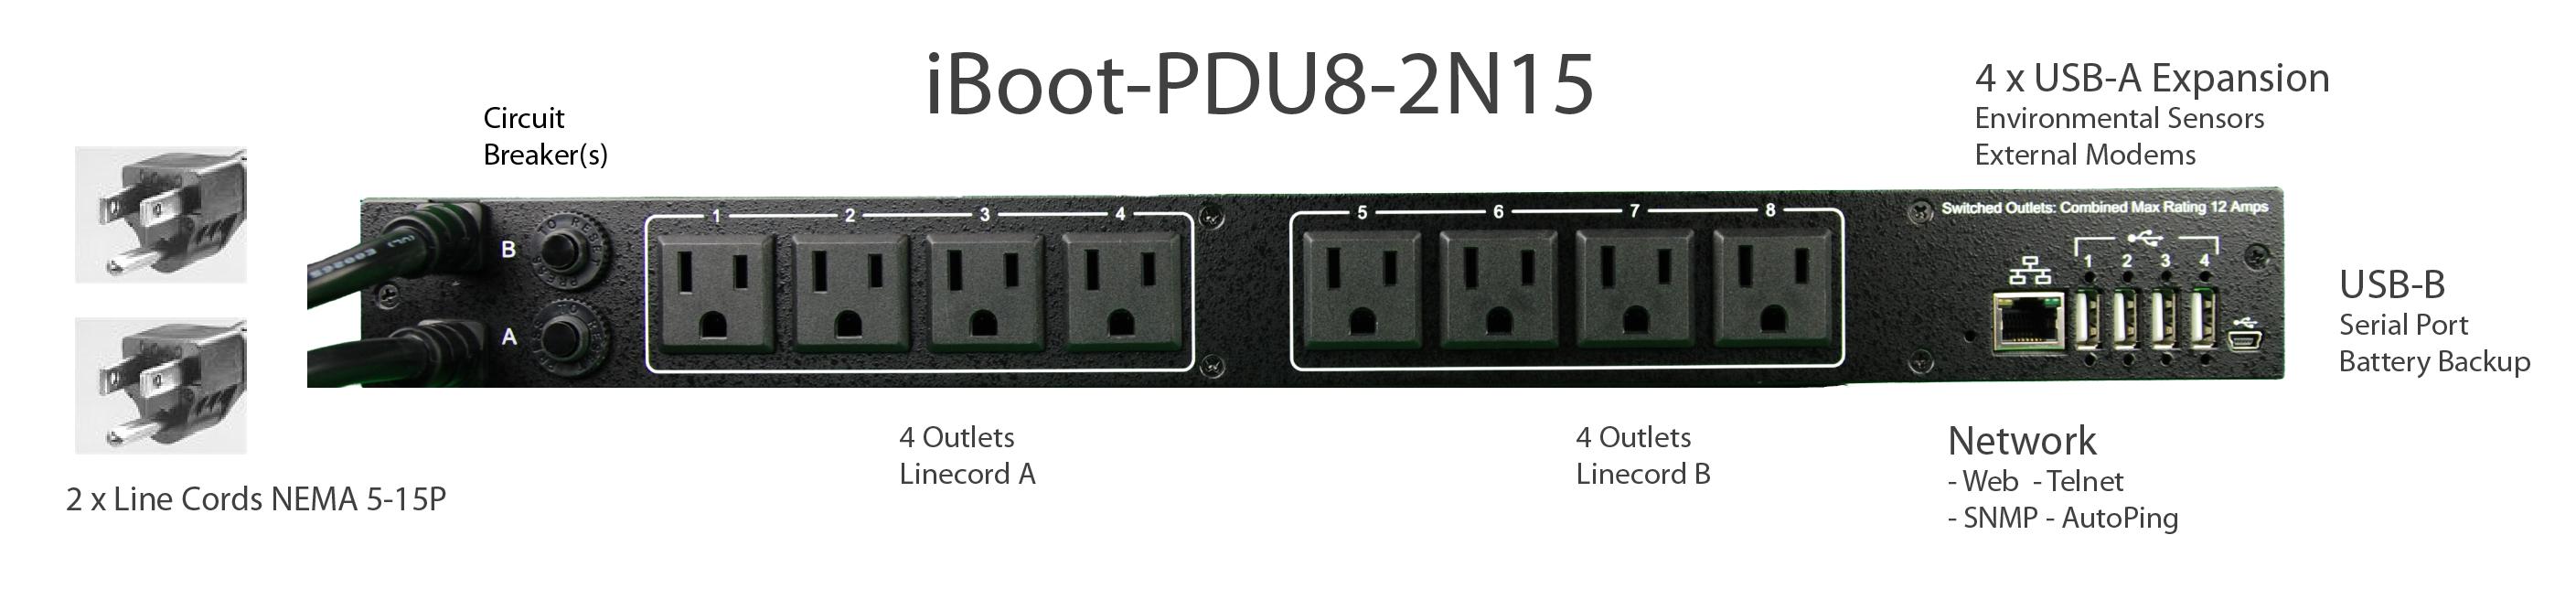 iBoot-PDU8-2N15 for Remote Reboot, 2 x NEMA 5-15P.